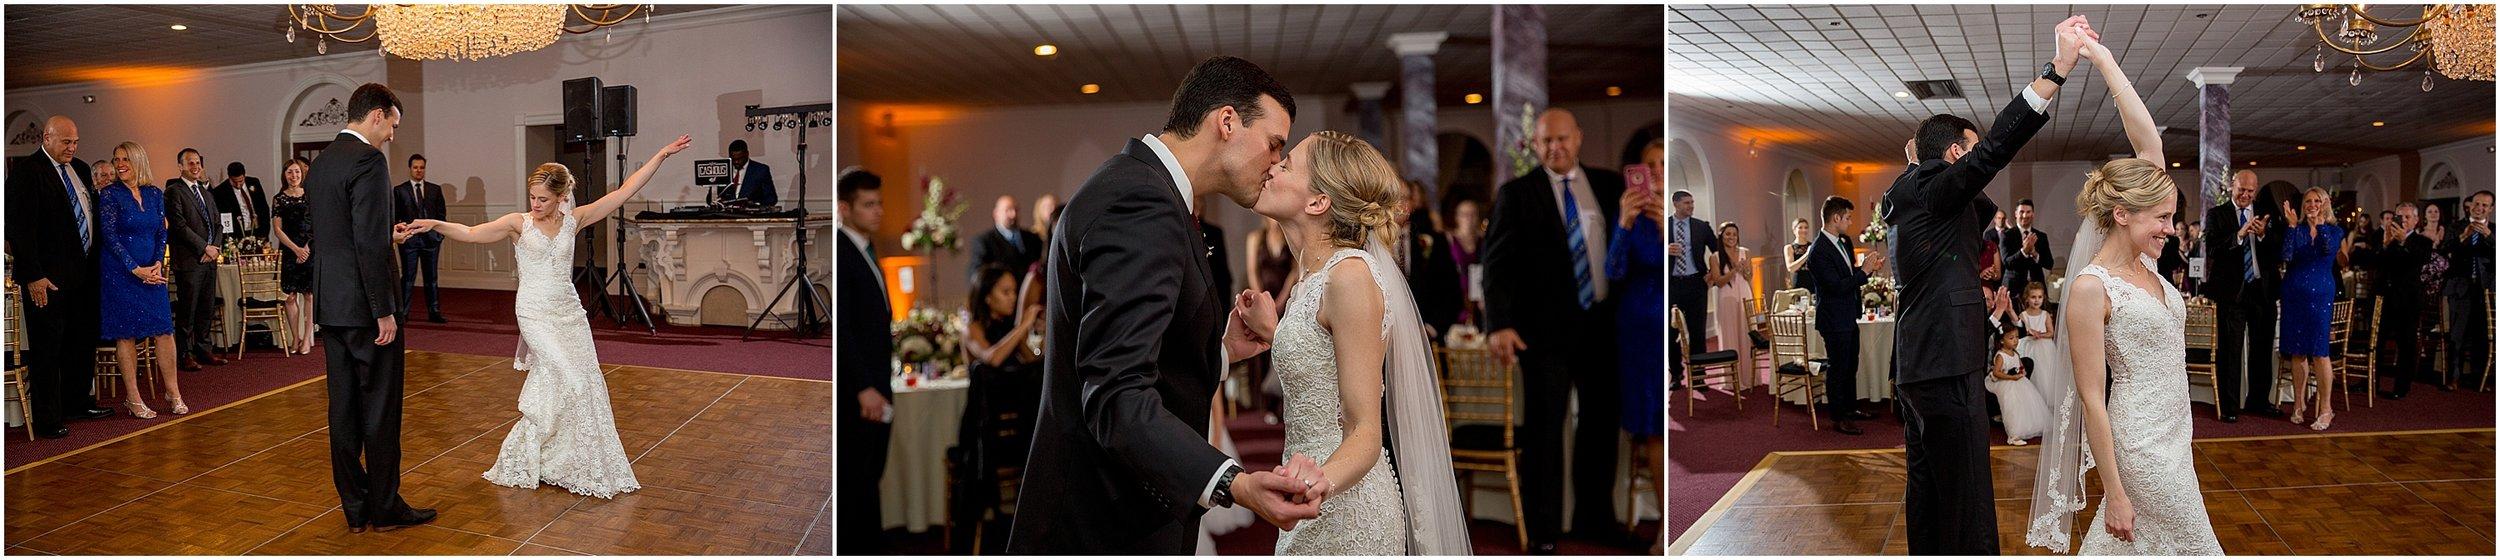 Williamsport_Disalvos_Wedding_0045.jpg